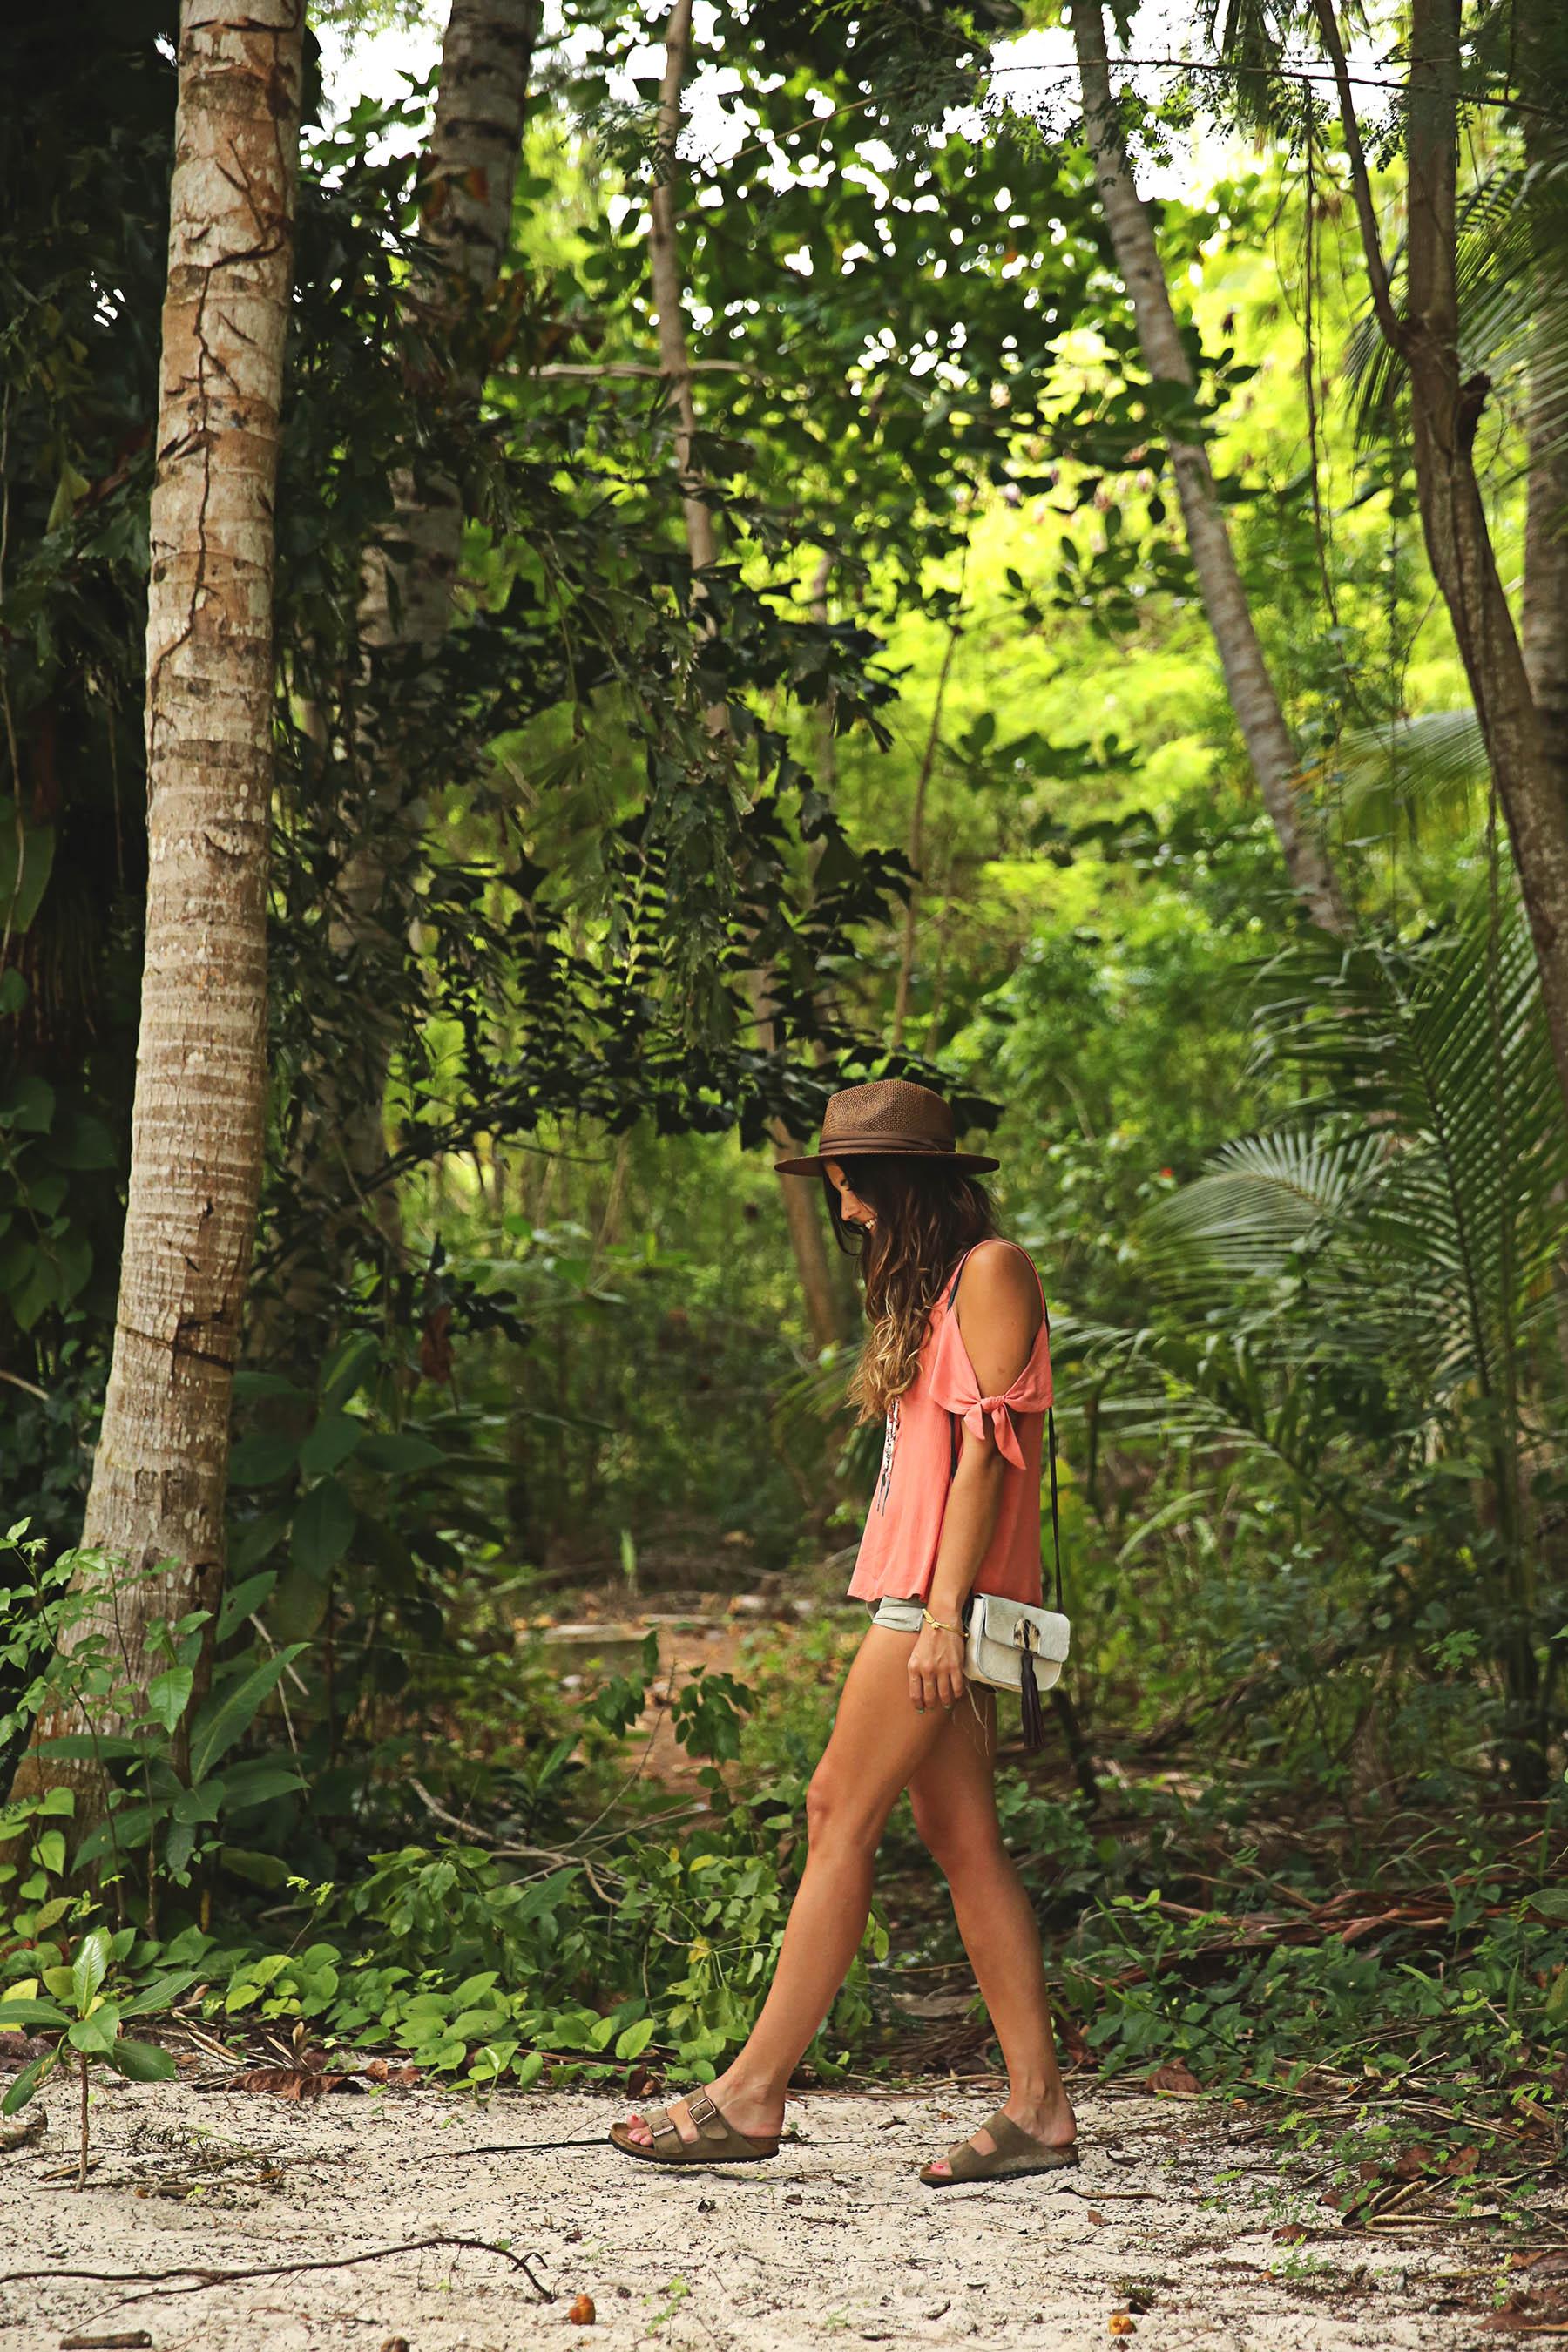 trendy-taste-look-outfit-street-style-ootd-blog-blogger-fashion-spain-moda-españa-boho-hippie-verano-birkenstock-bavaro-barcelo-khaki-caqui-shorts-sombrero-top-9